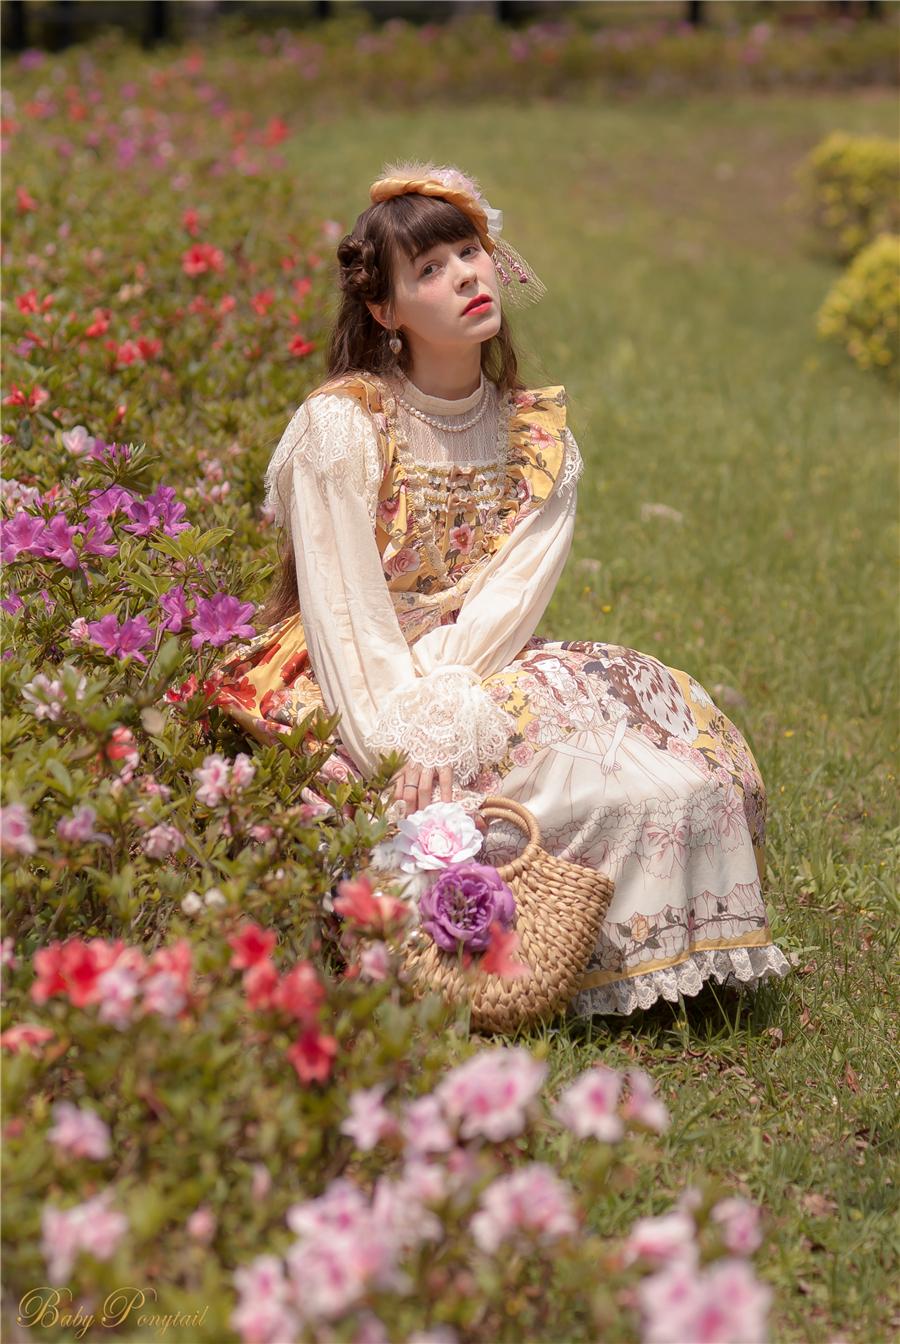 Baby Ponytail_Model Photo_Polly's Garden of Dreams_JSK Yellow_Claudia_5.jpg